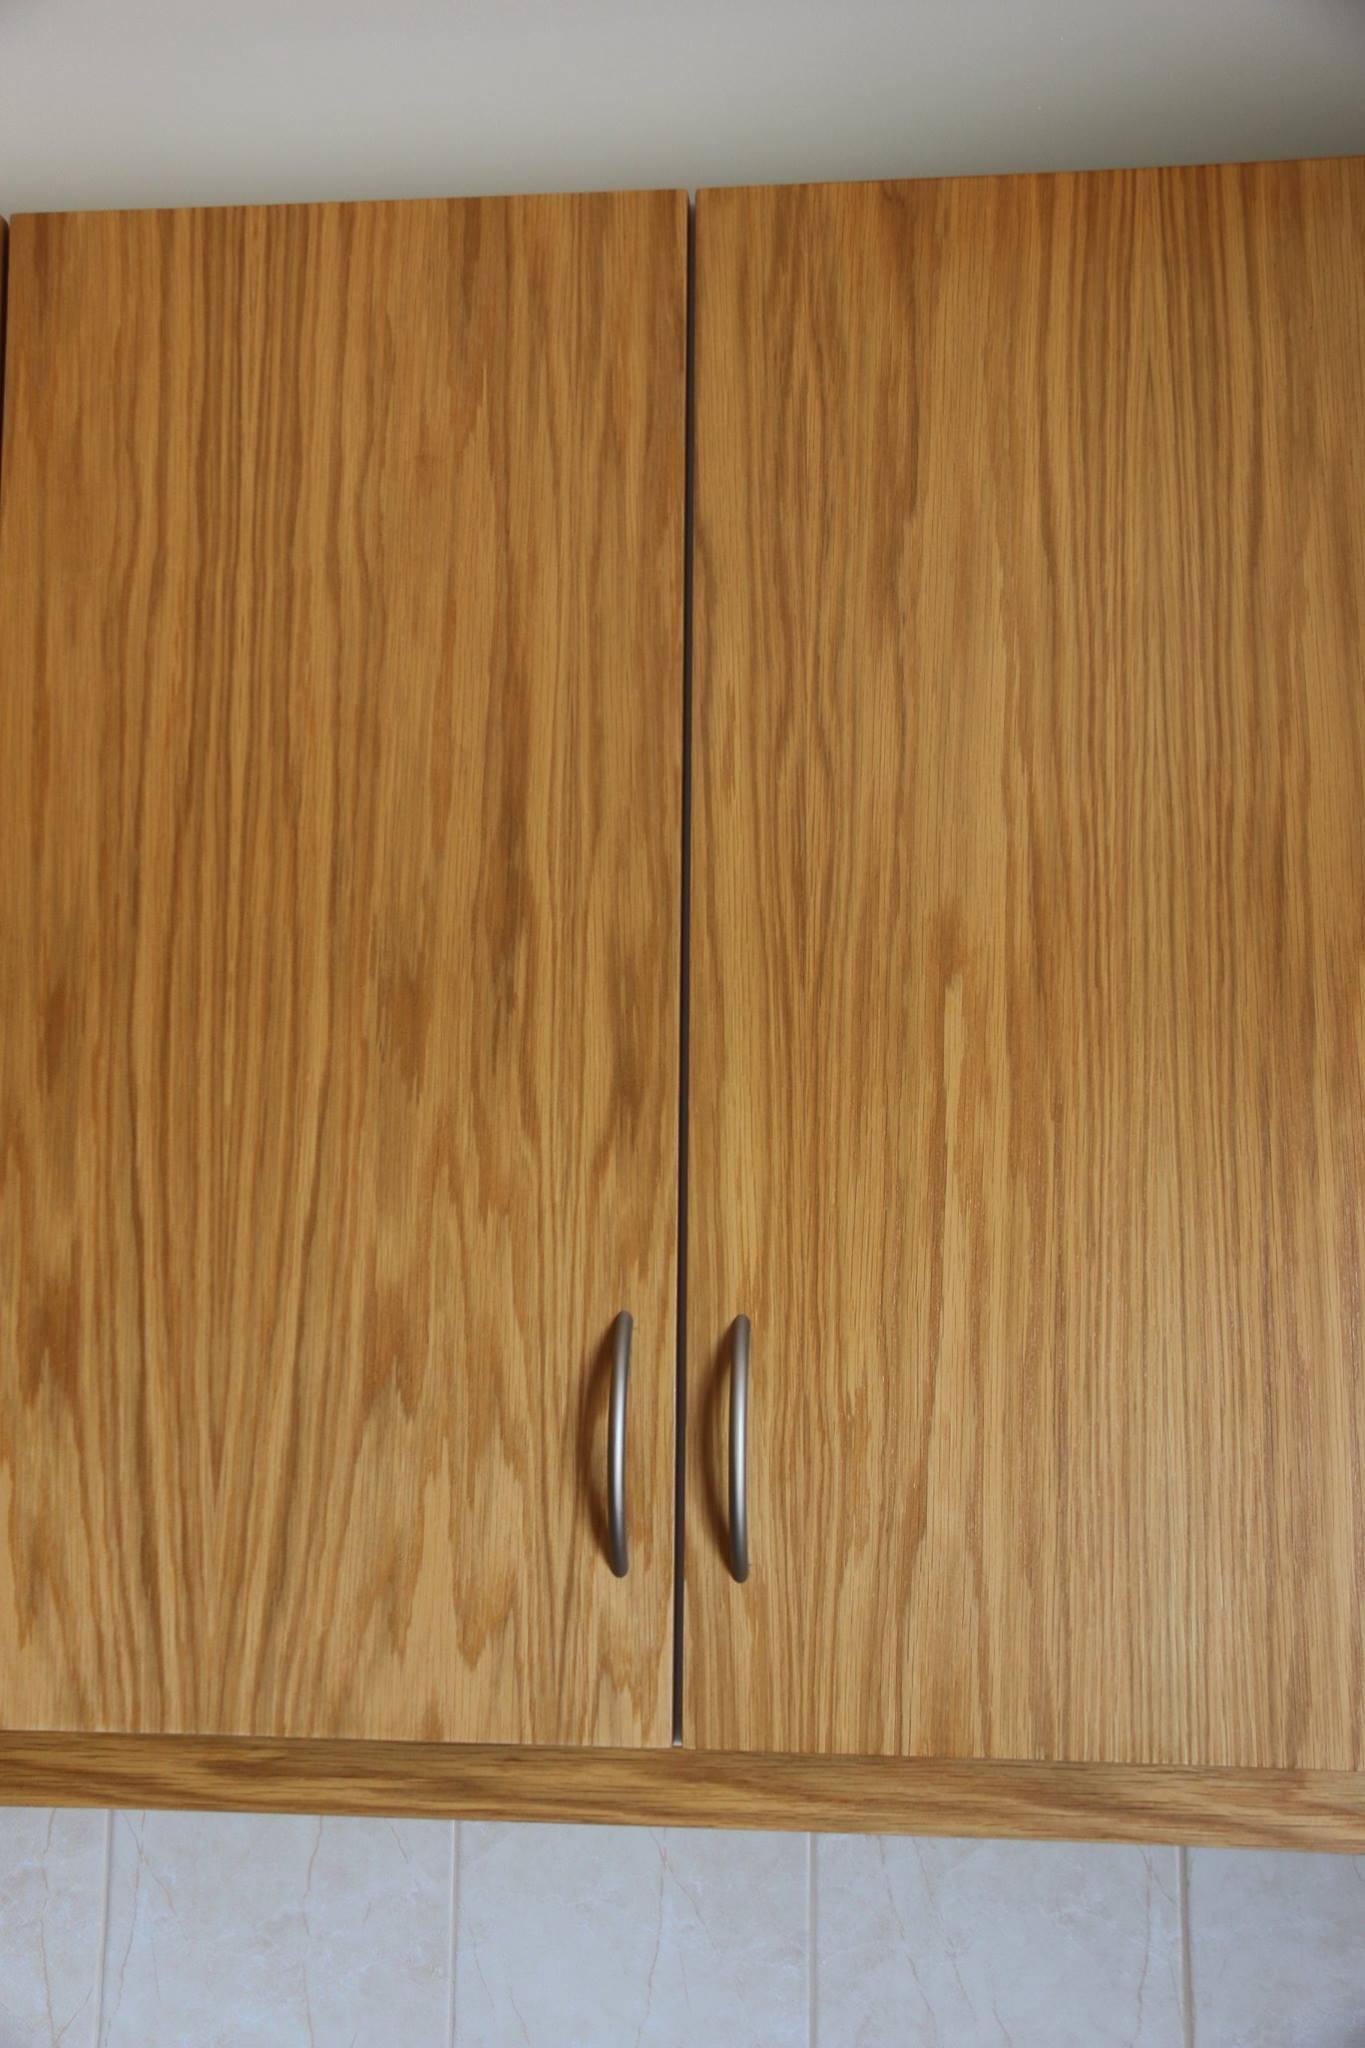 Carpintaria/Marcenaria